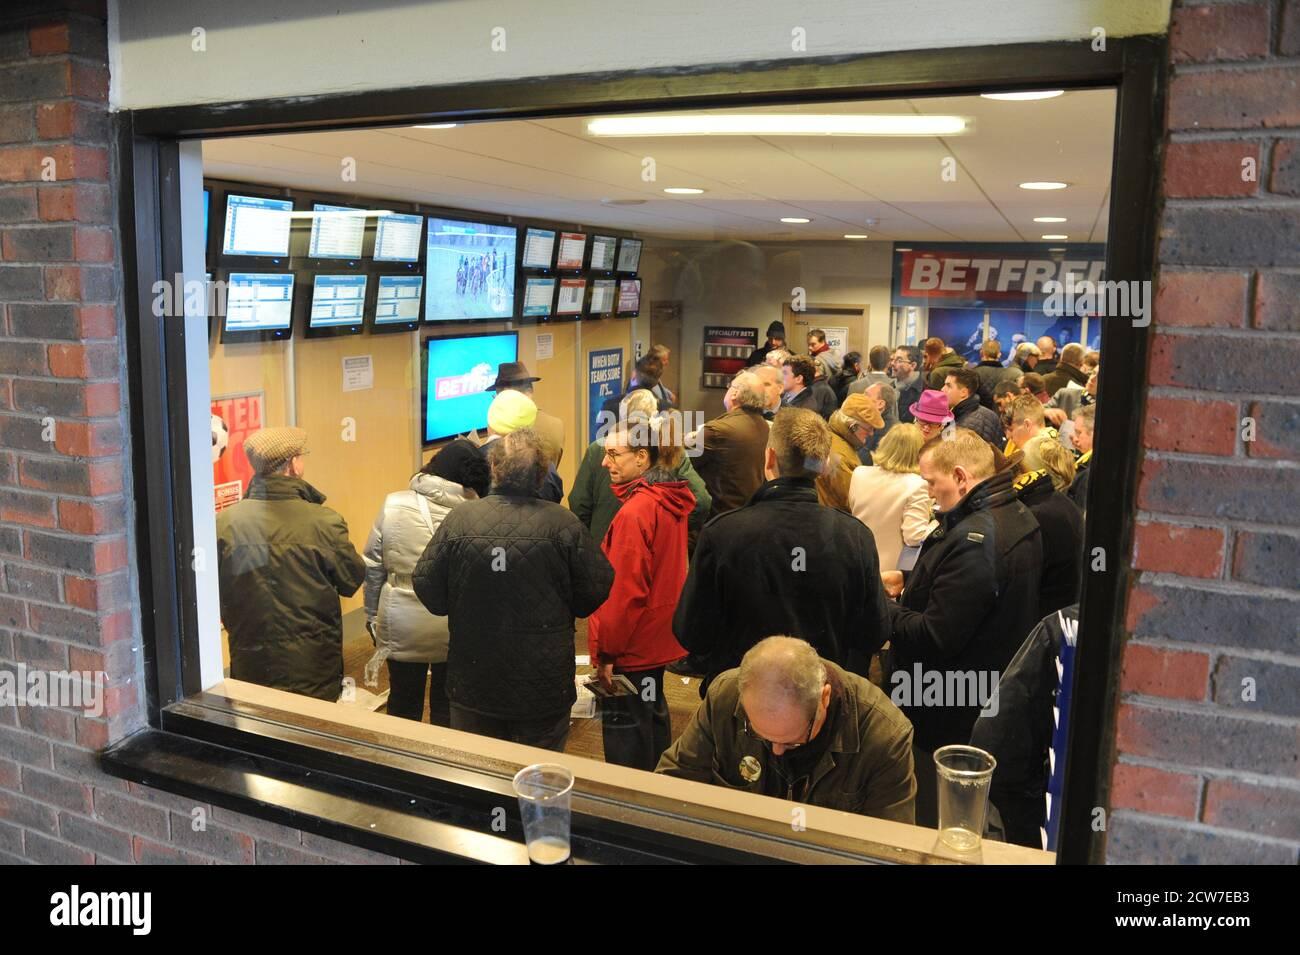 fakenham betting shops in leatherhead